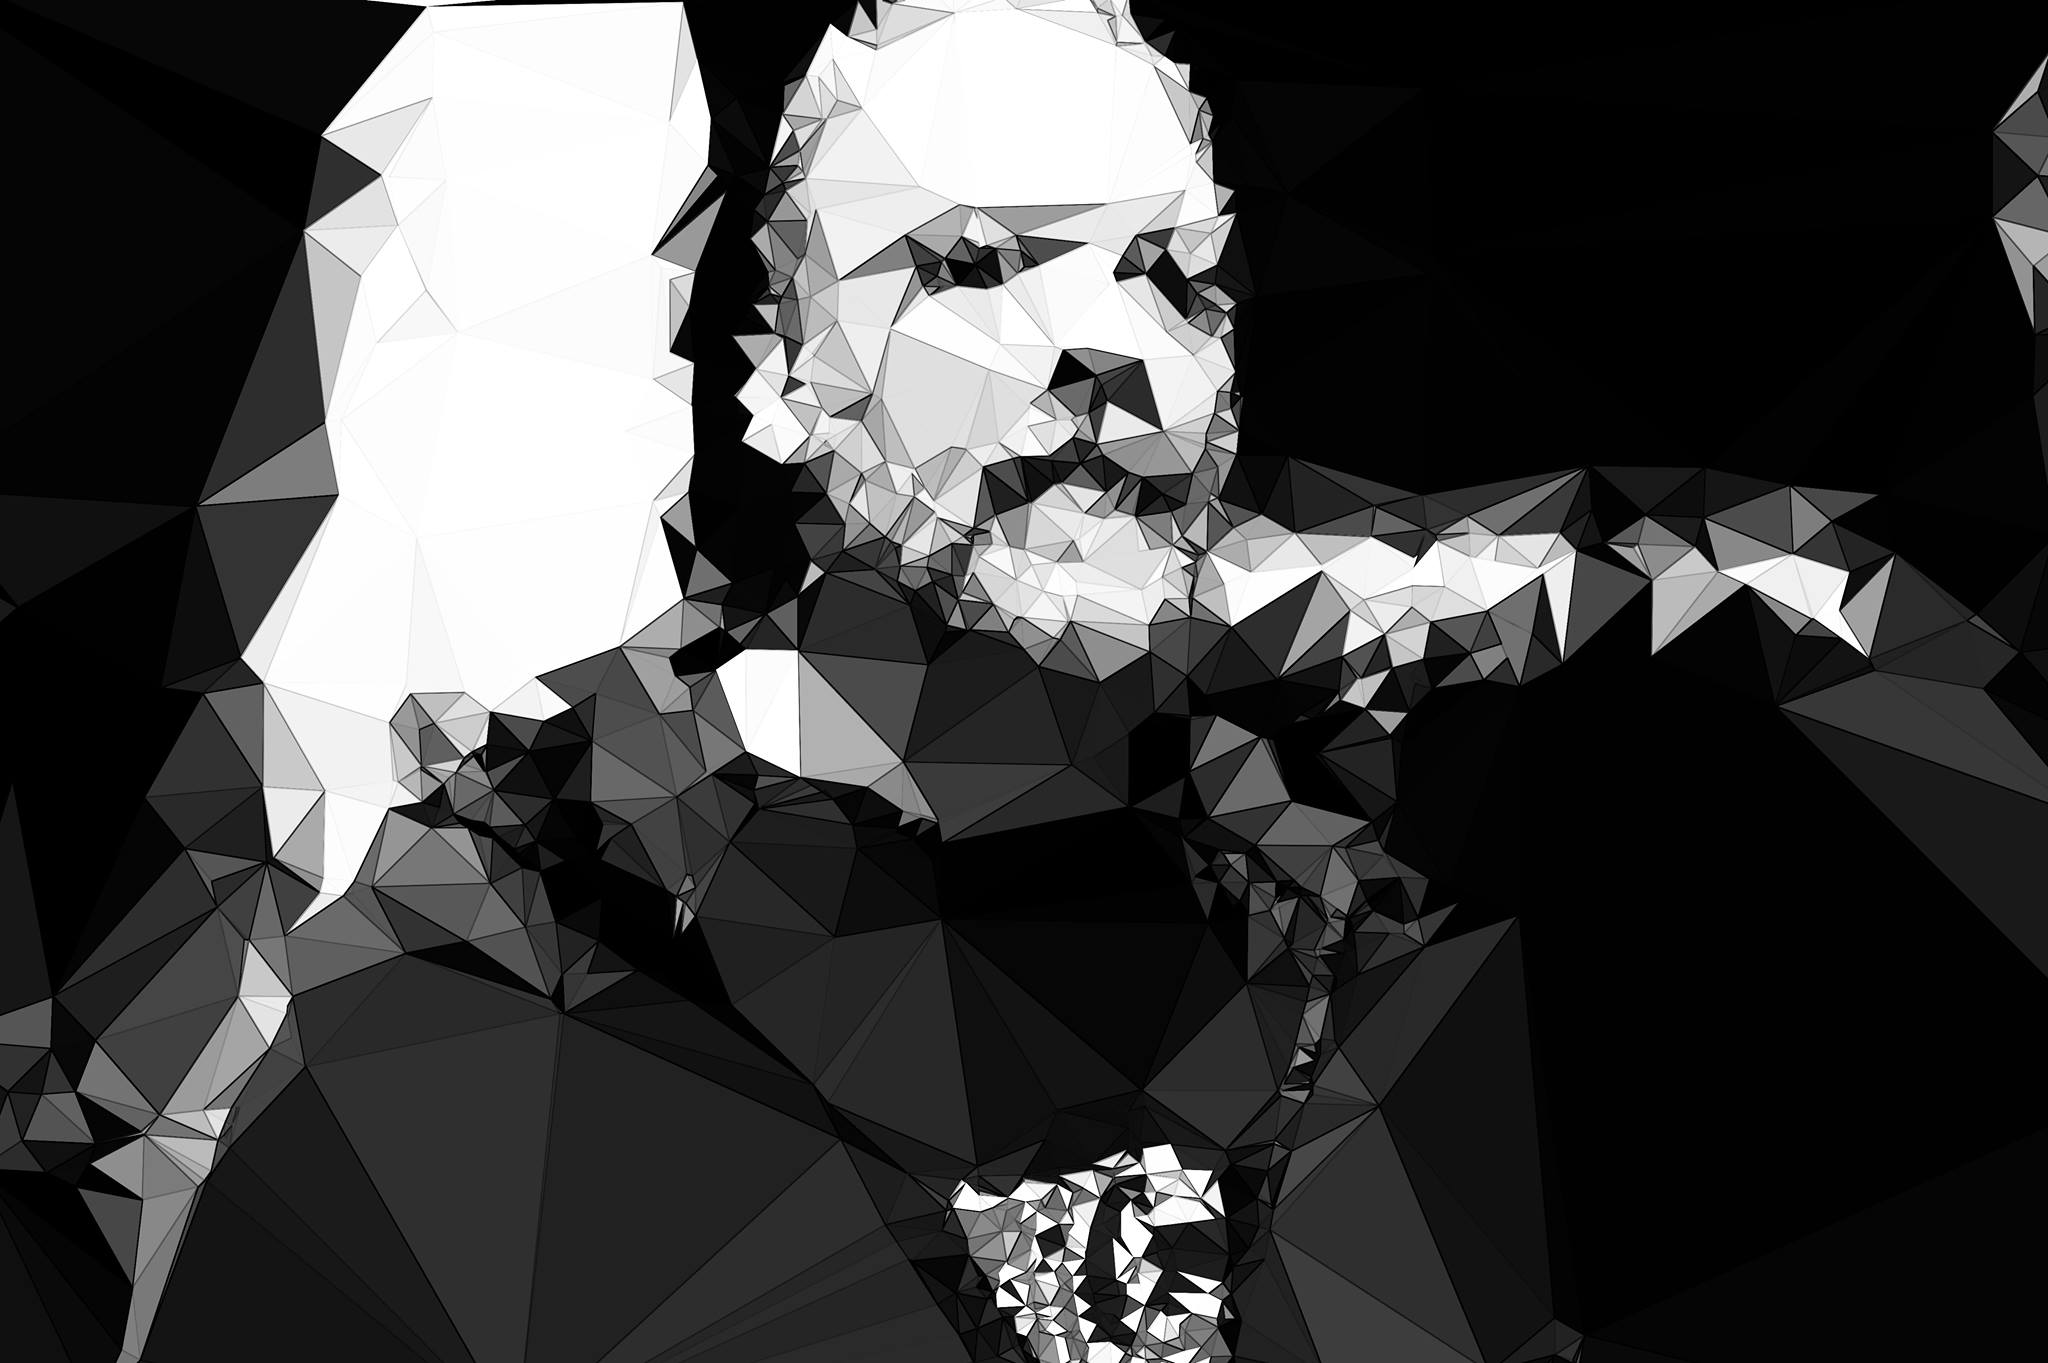 self-portrait | using Delaunay's triangulation